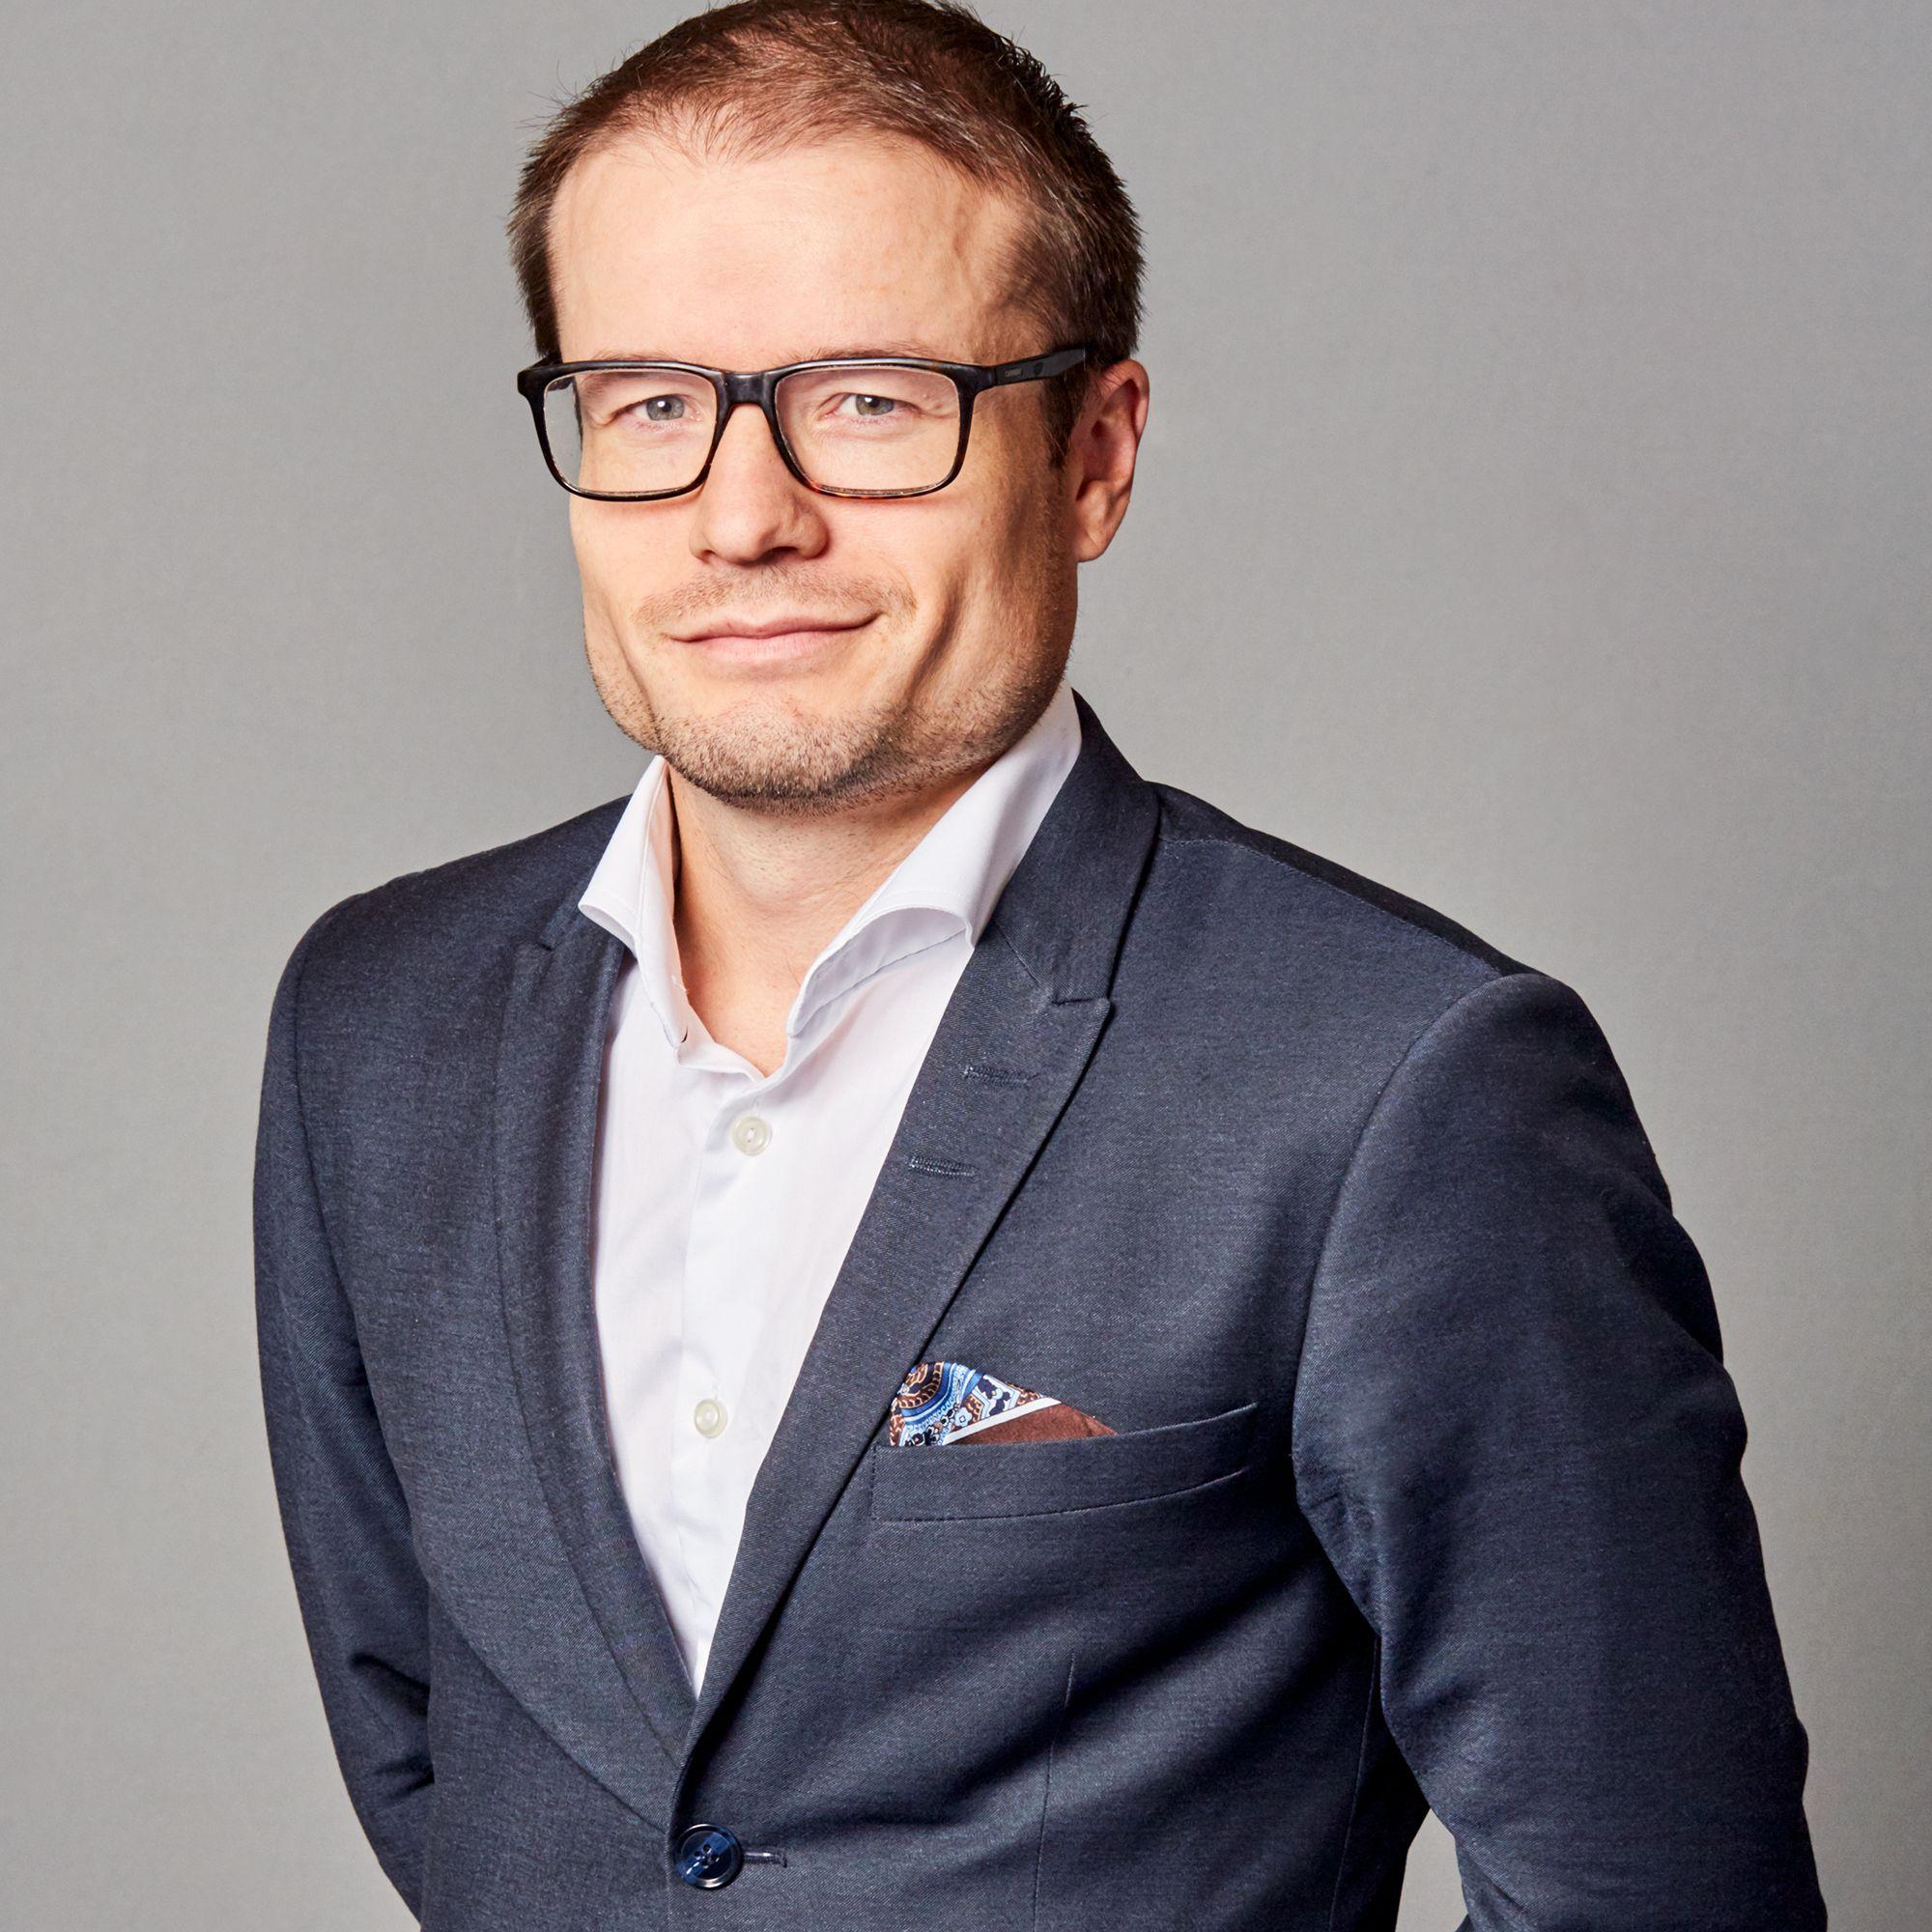 Dan-Christian Jensen